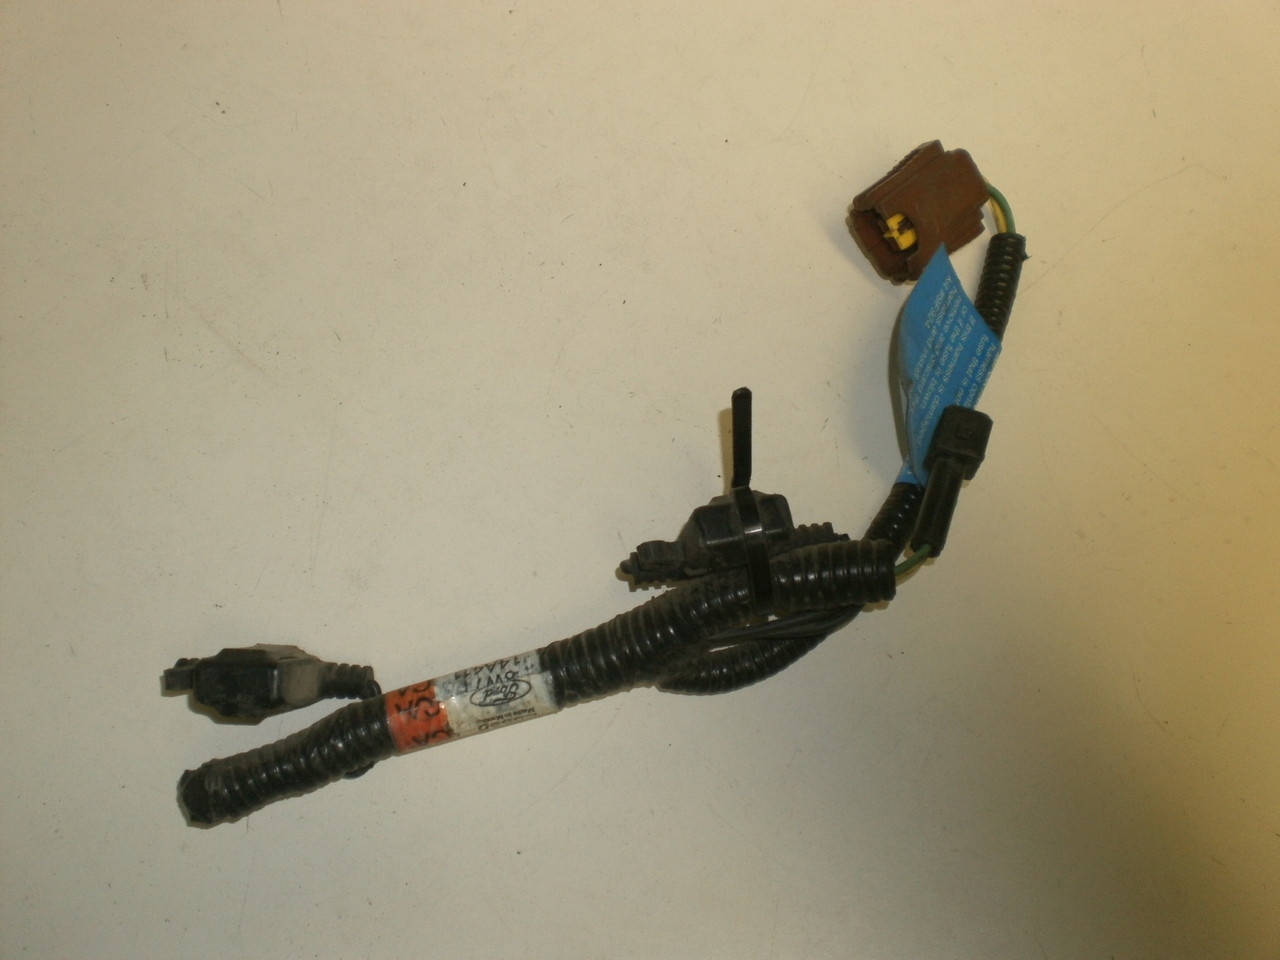 [SCHEMATICS_4US]  1995-2001 Ford Explorer Speed Control Wire Harness Repair Recall  8W7T-14A411-CA - FordOnlyParts.com | Ford Wire Harness Repair |  | Ford , Lincoln , Mercury Parts